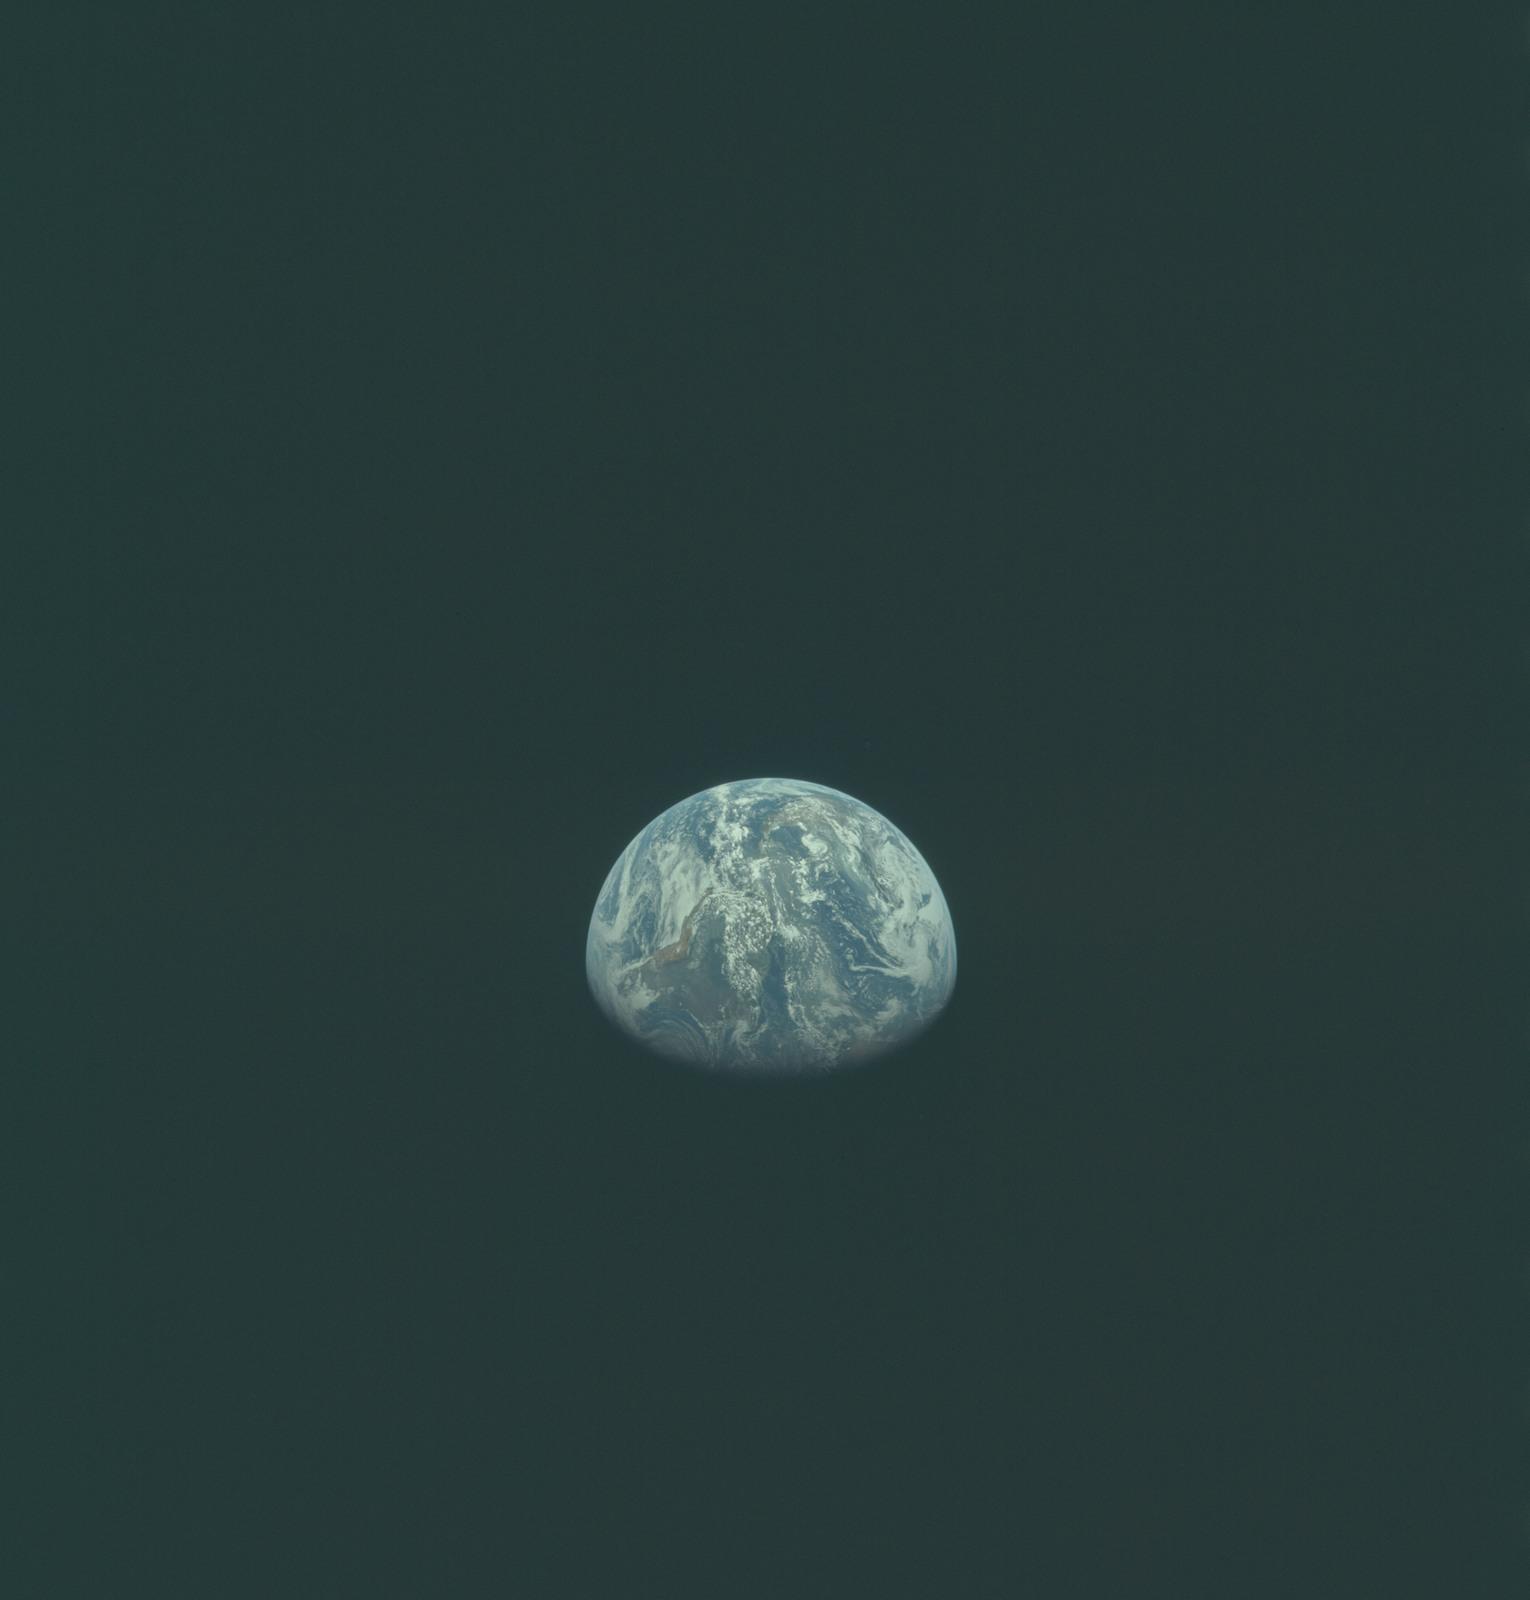 AS11-36-5362 - Apollo 11 - Apollo 11 Mission image - Earth view over Africa